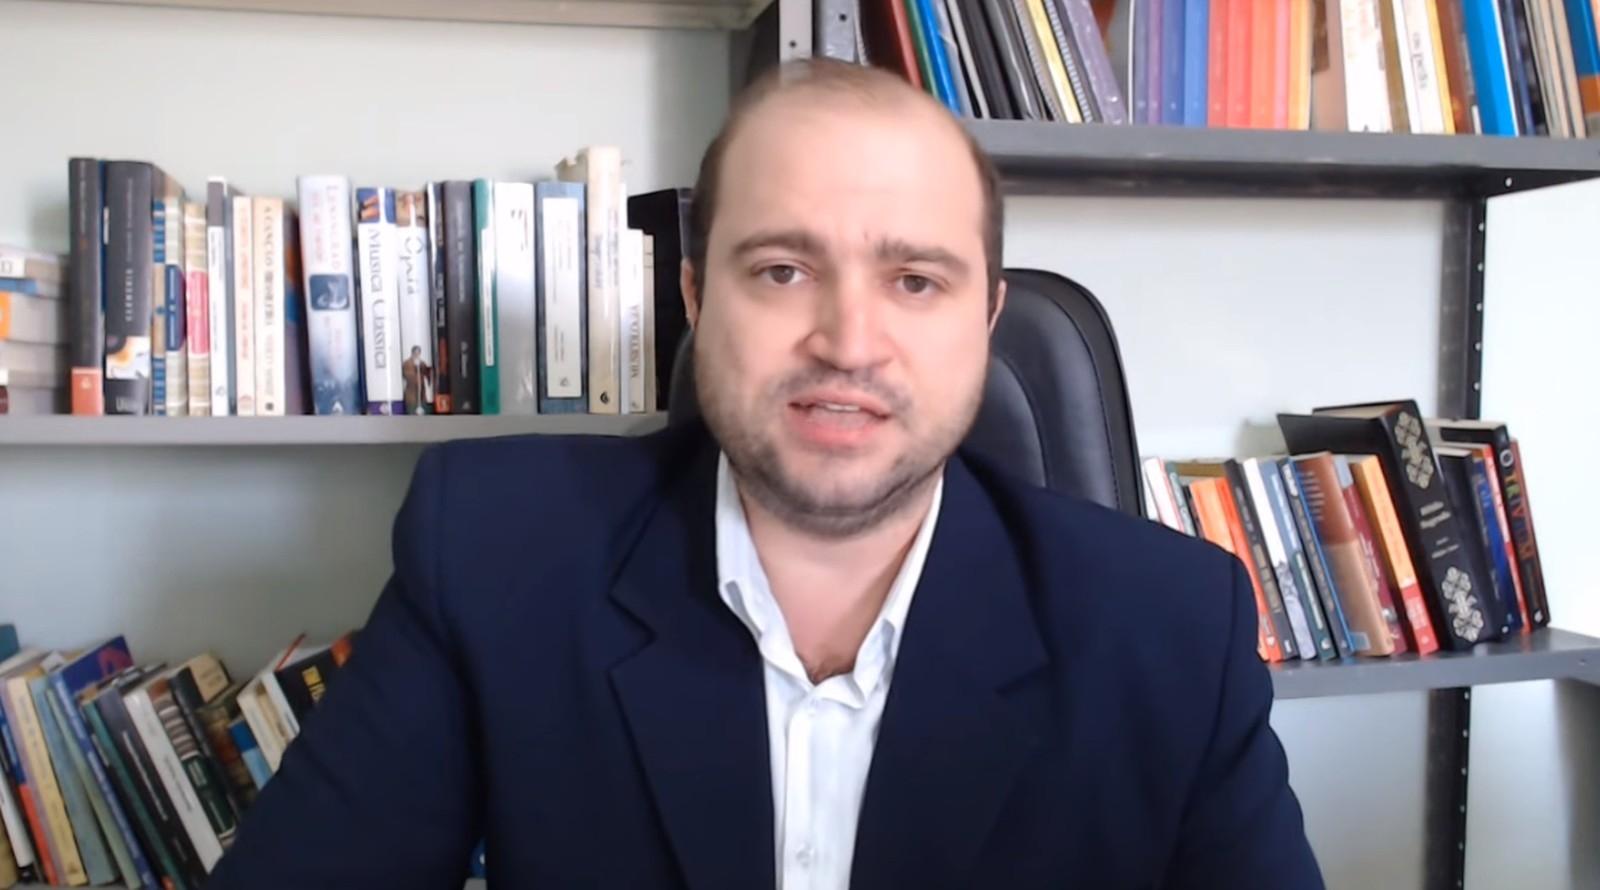 Novo presidente da Funarte, Dante Mantovani